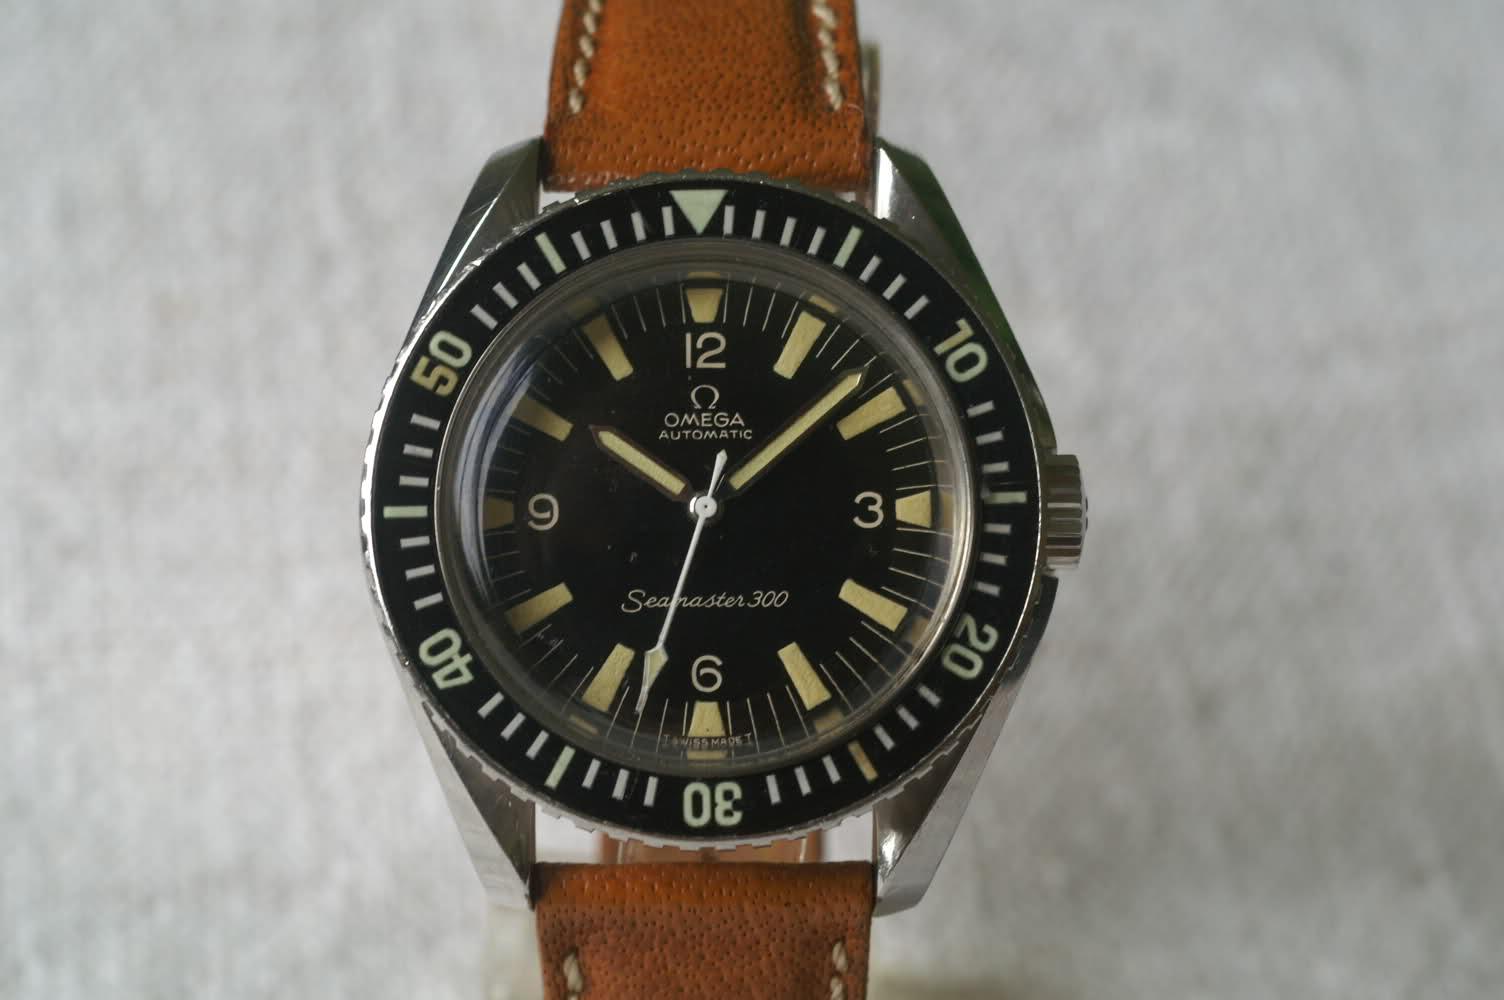 FEU de vos seamaster 300 vintage ou watchco Op1egw